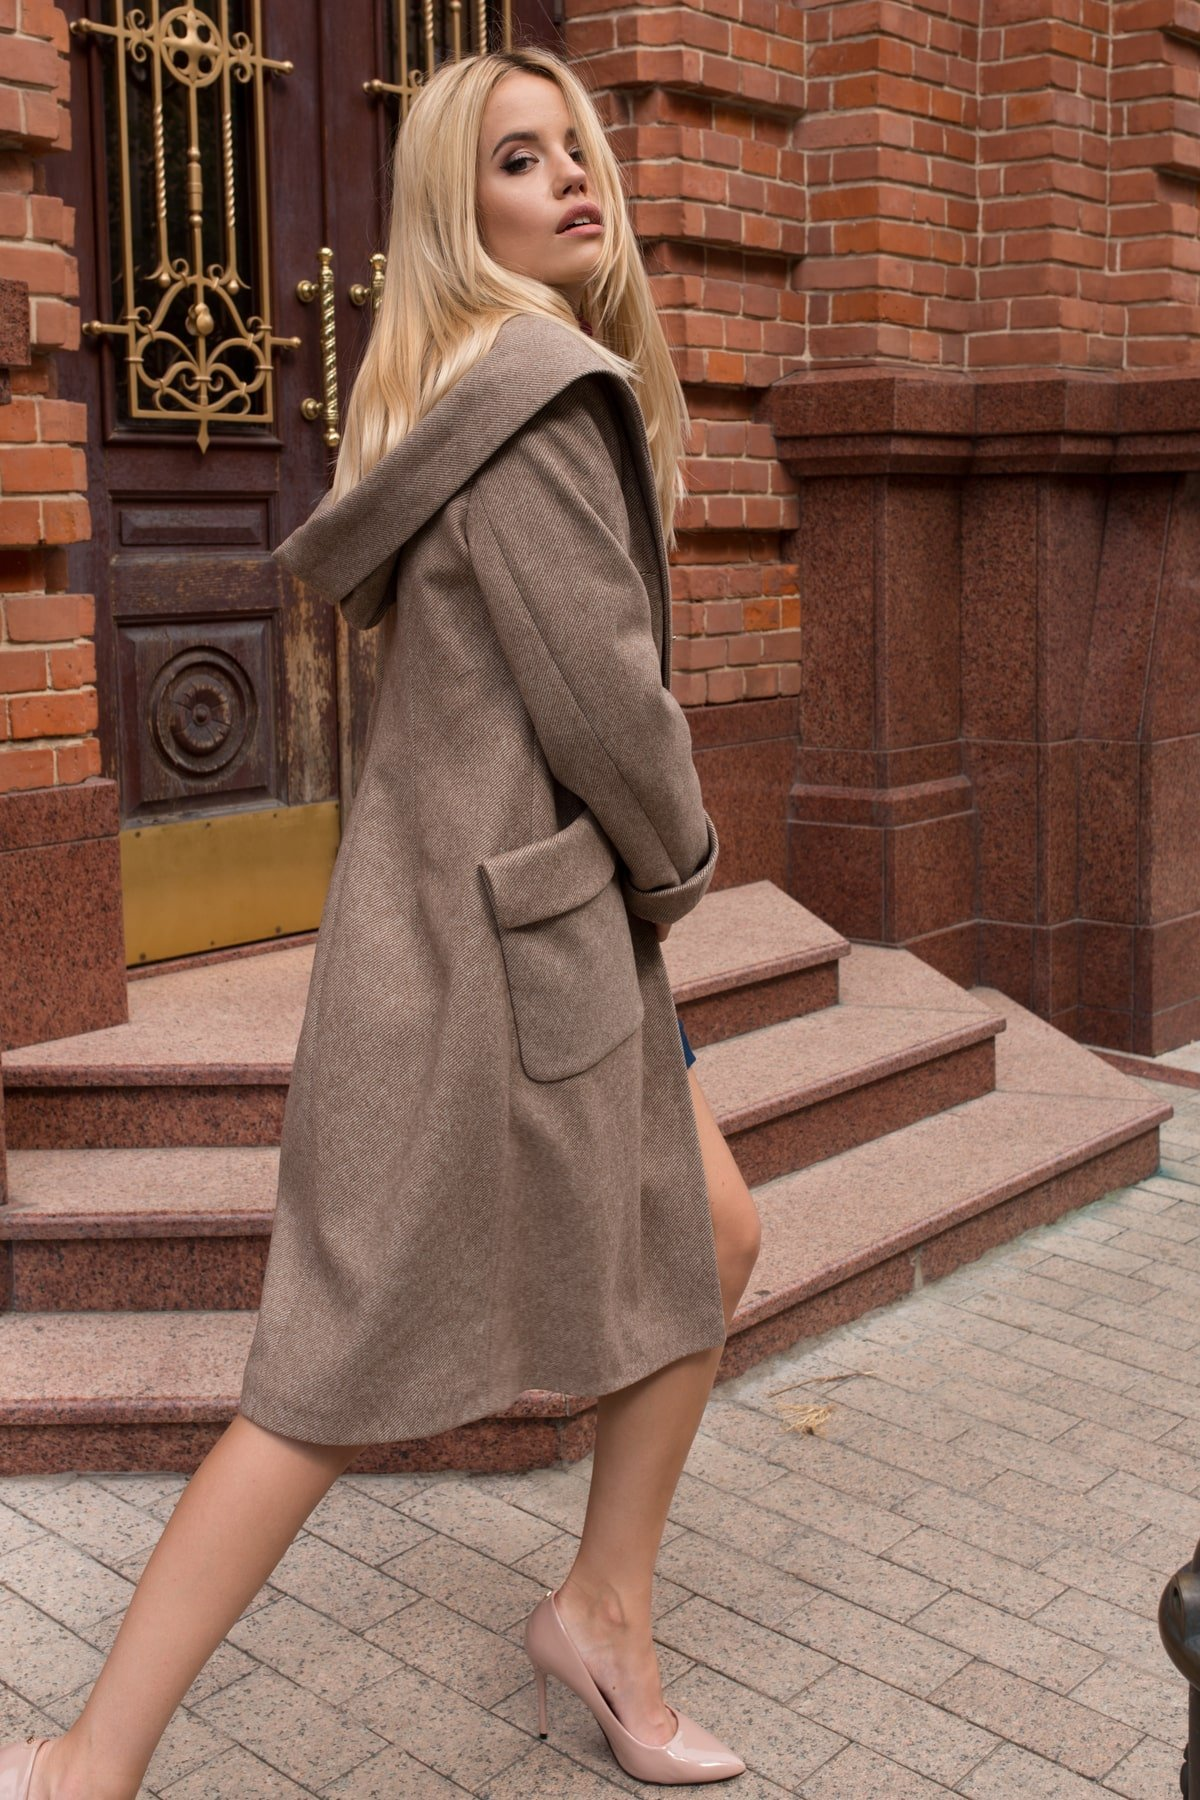 Пальто Анджи 7806 АРТ. 45168 Цвет: Капучино 31 - фото 5, интернет магазин tm-modus.ru